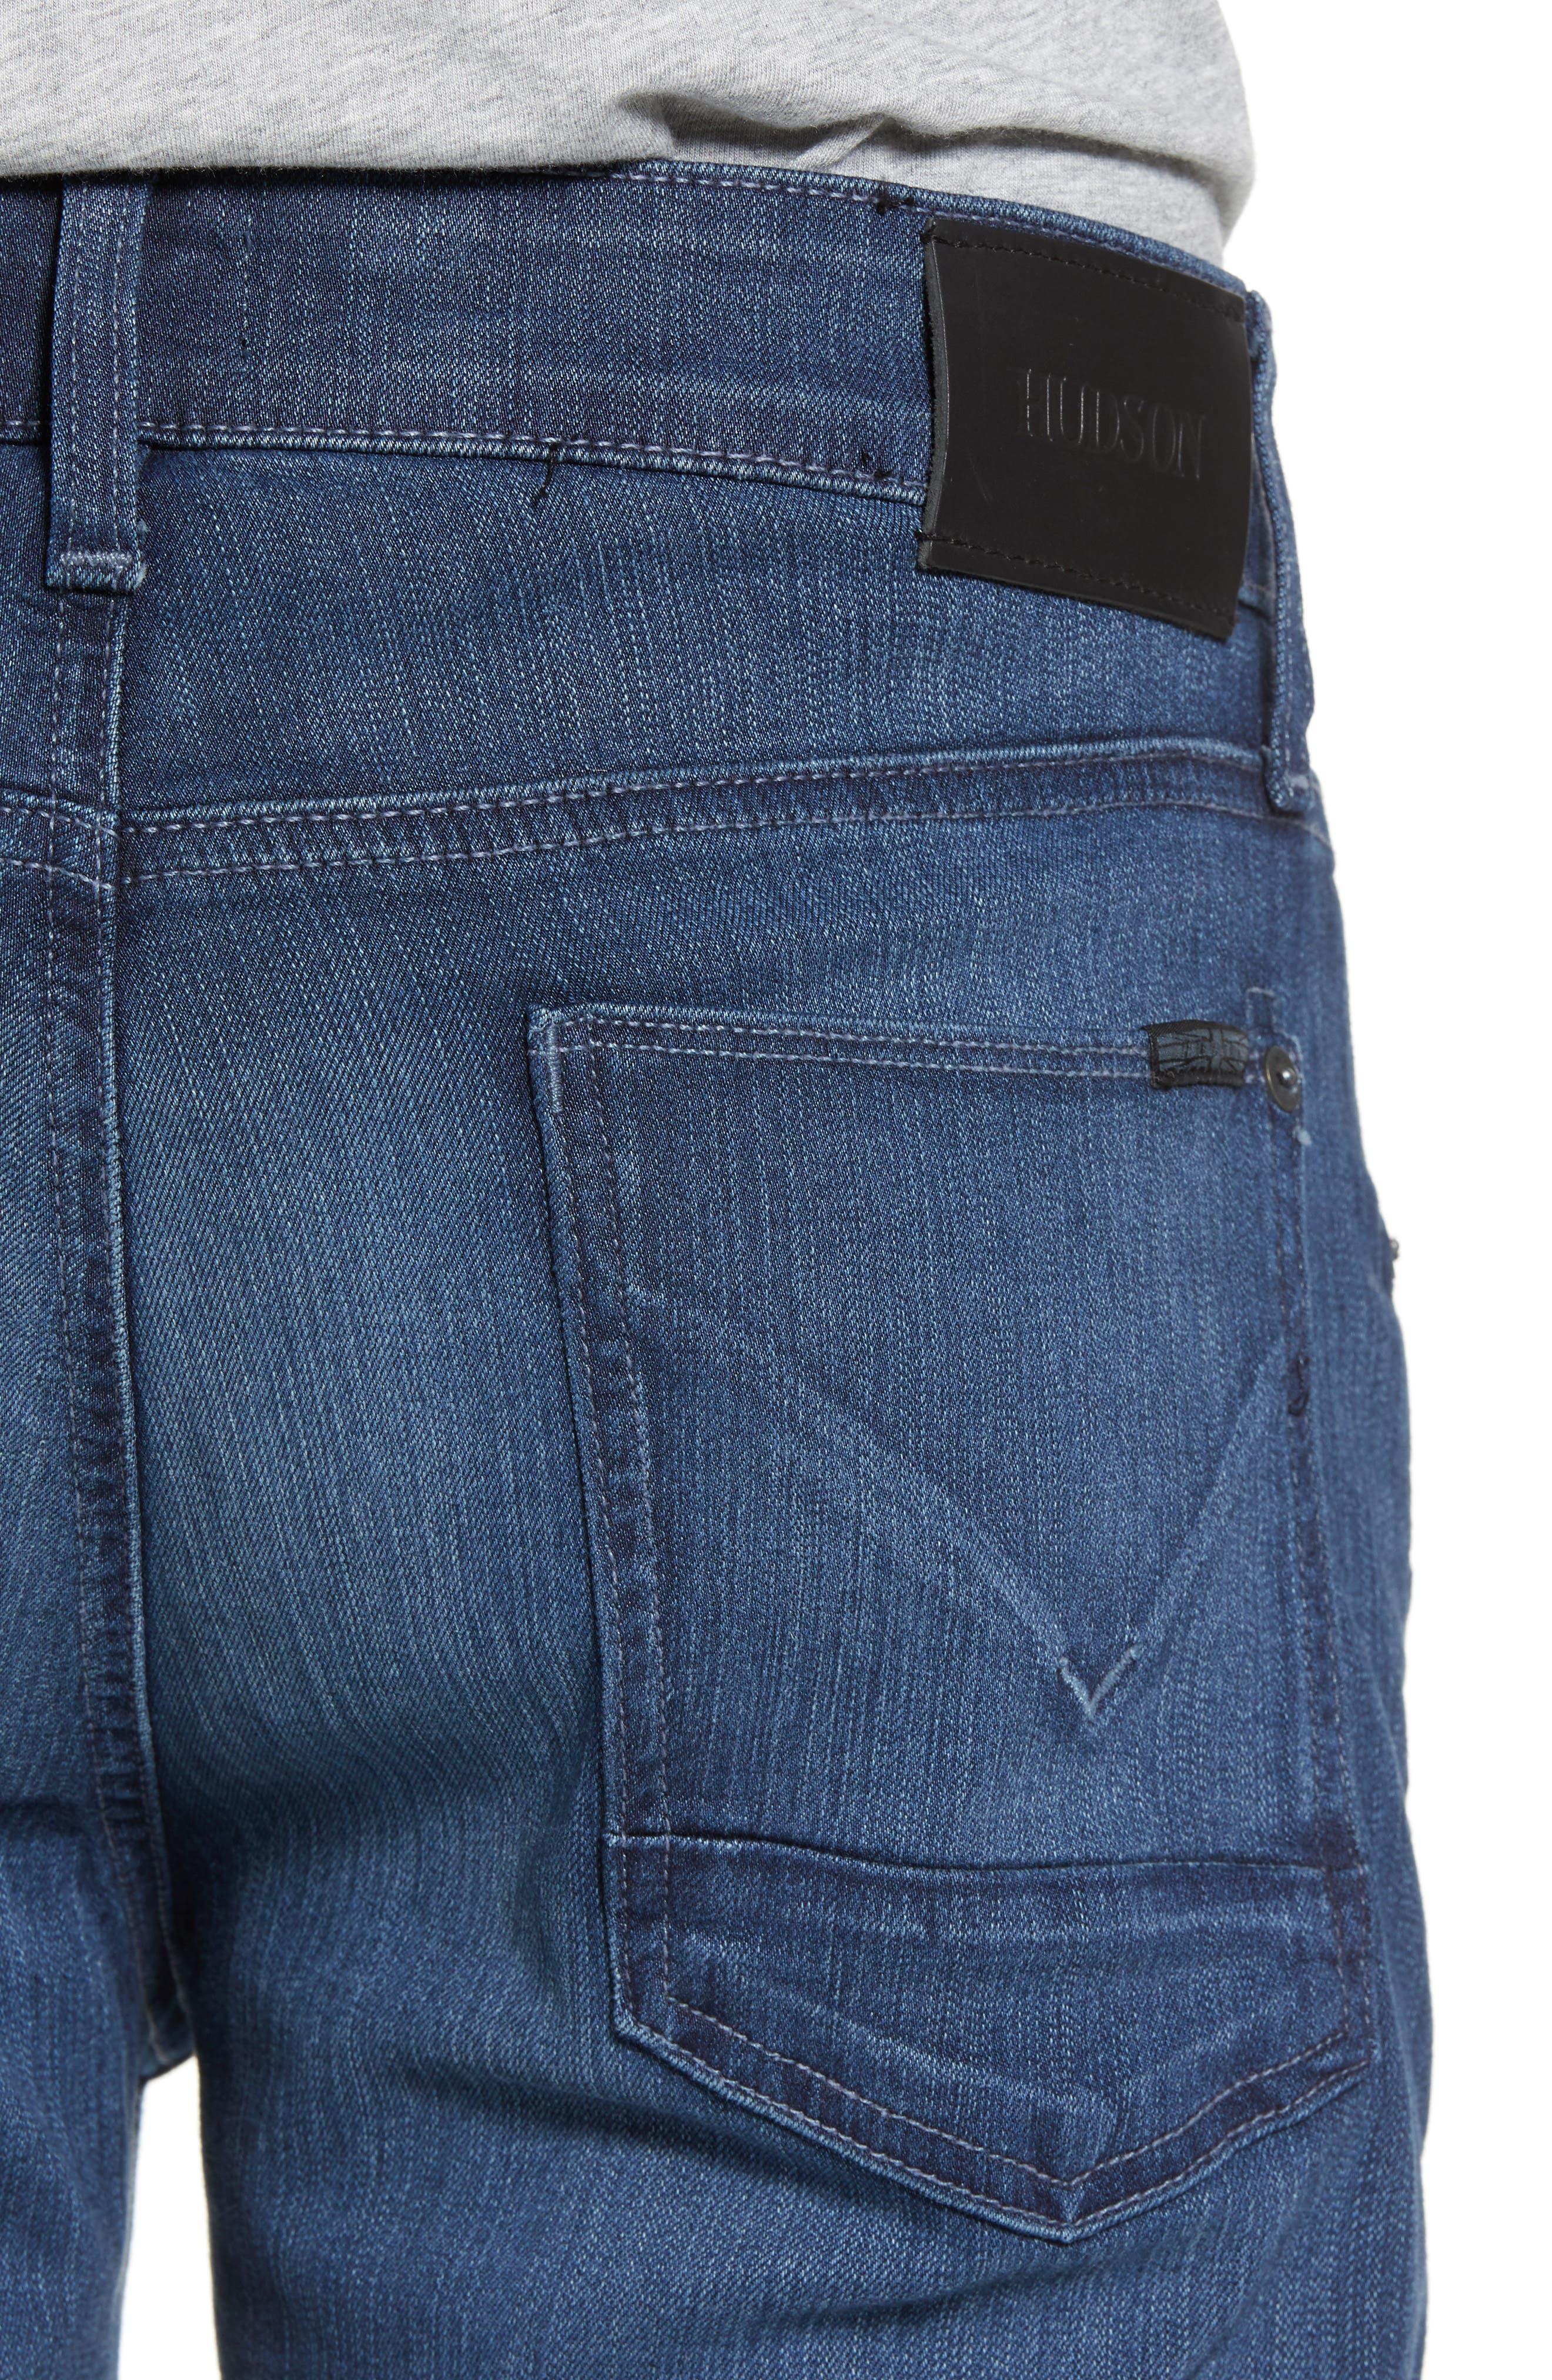 Byron Slim Straight Leg Jeans,                             Alternate thumbnail 4, color,                             403